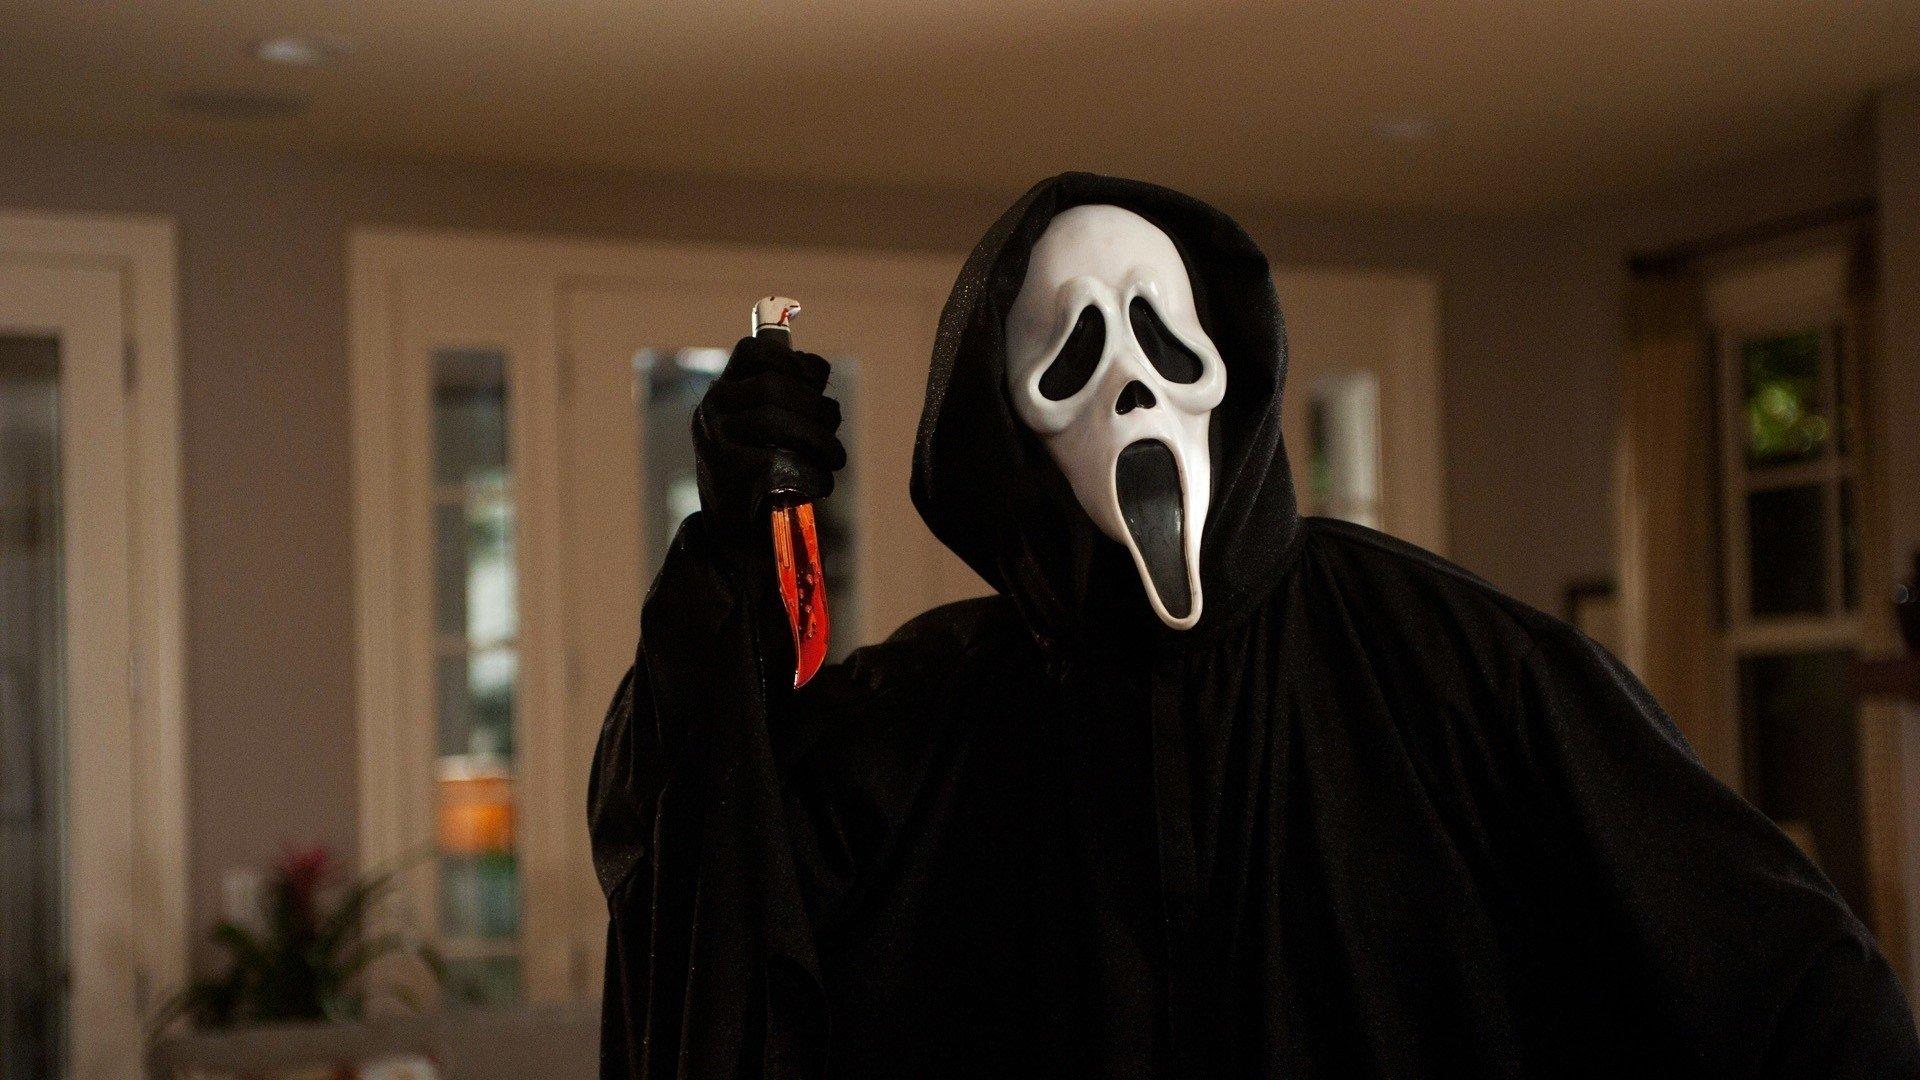 All About Scream Wallpaper design ideas